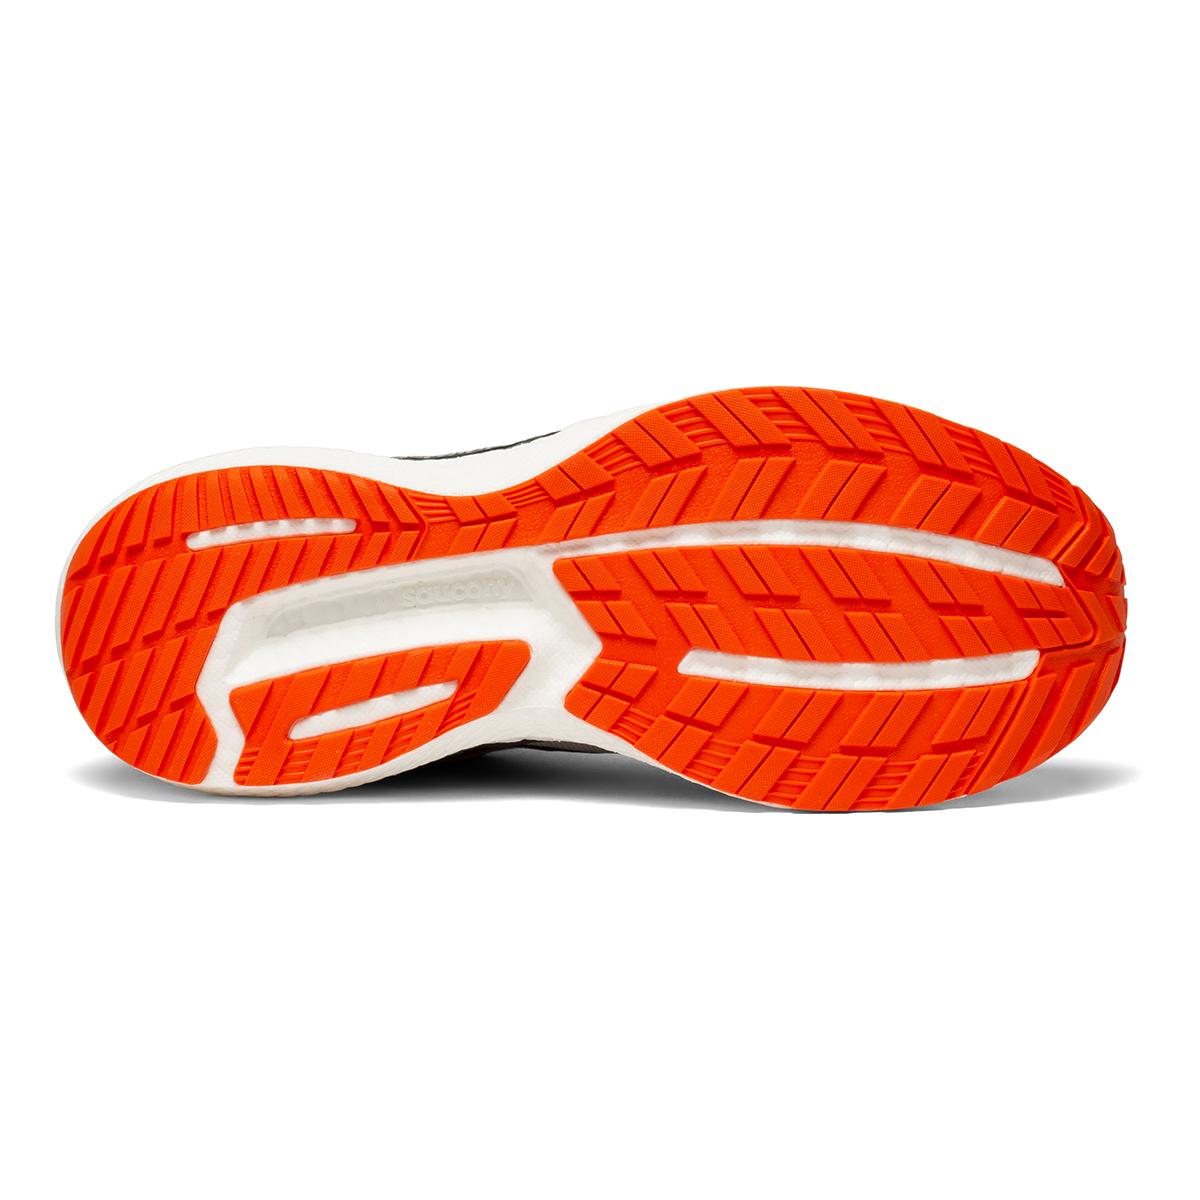 Men's Saucony Triumph 19 Running Shoe - Color: Alloy / Fire - Size: 7 - Width: Wide, Alloy / Fire, large, image 4